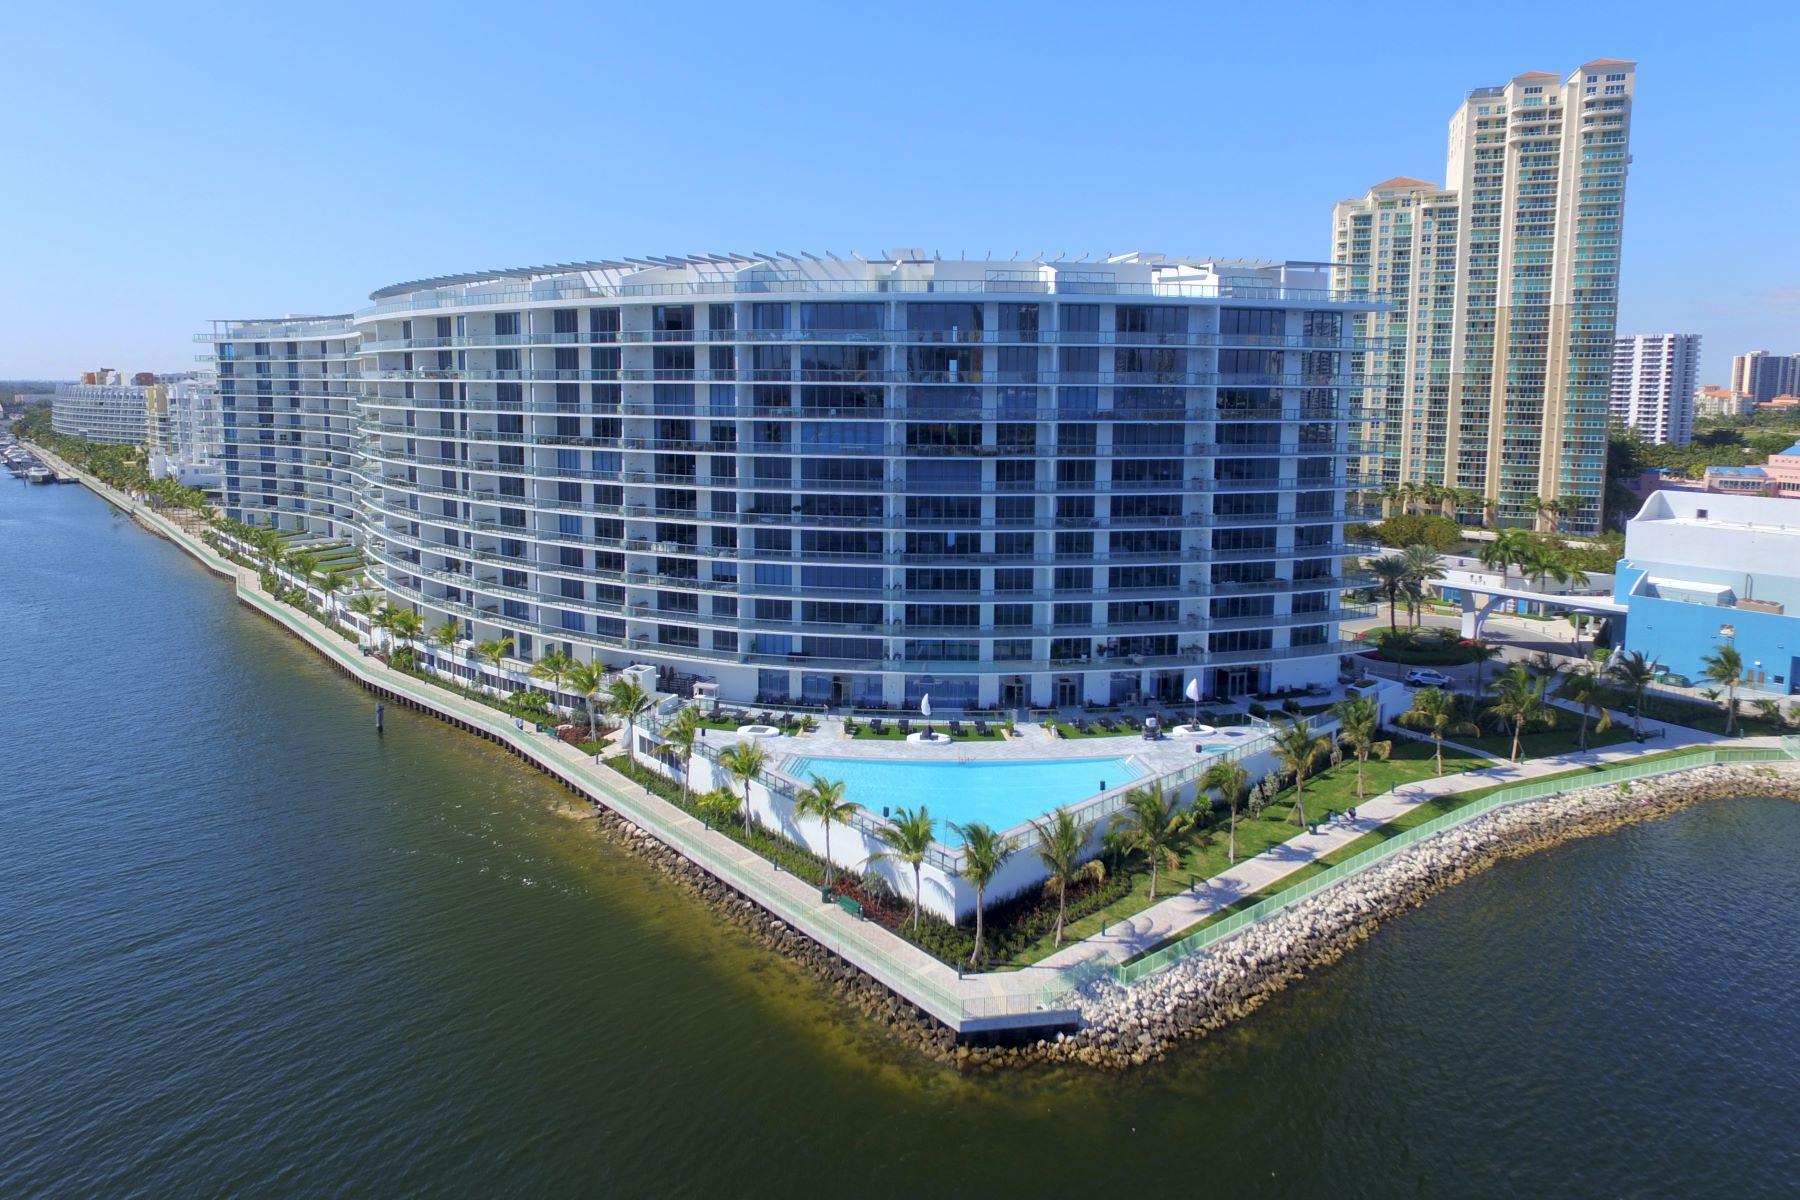 Condominio por un Venta en 3250 Ne 188th St #603 3250 Ne 188th St 603 Aventura, Florida, 33180 Estados Unidos